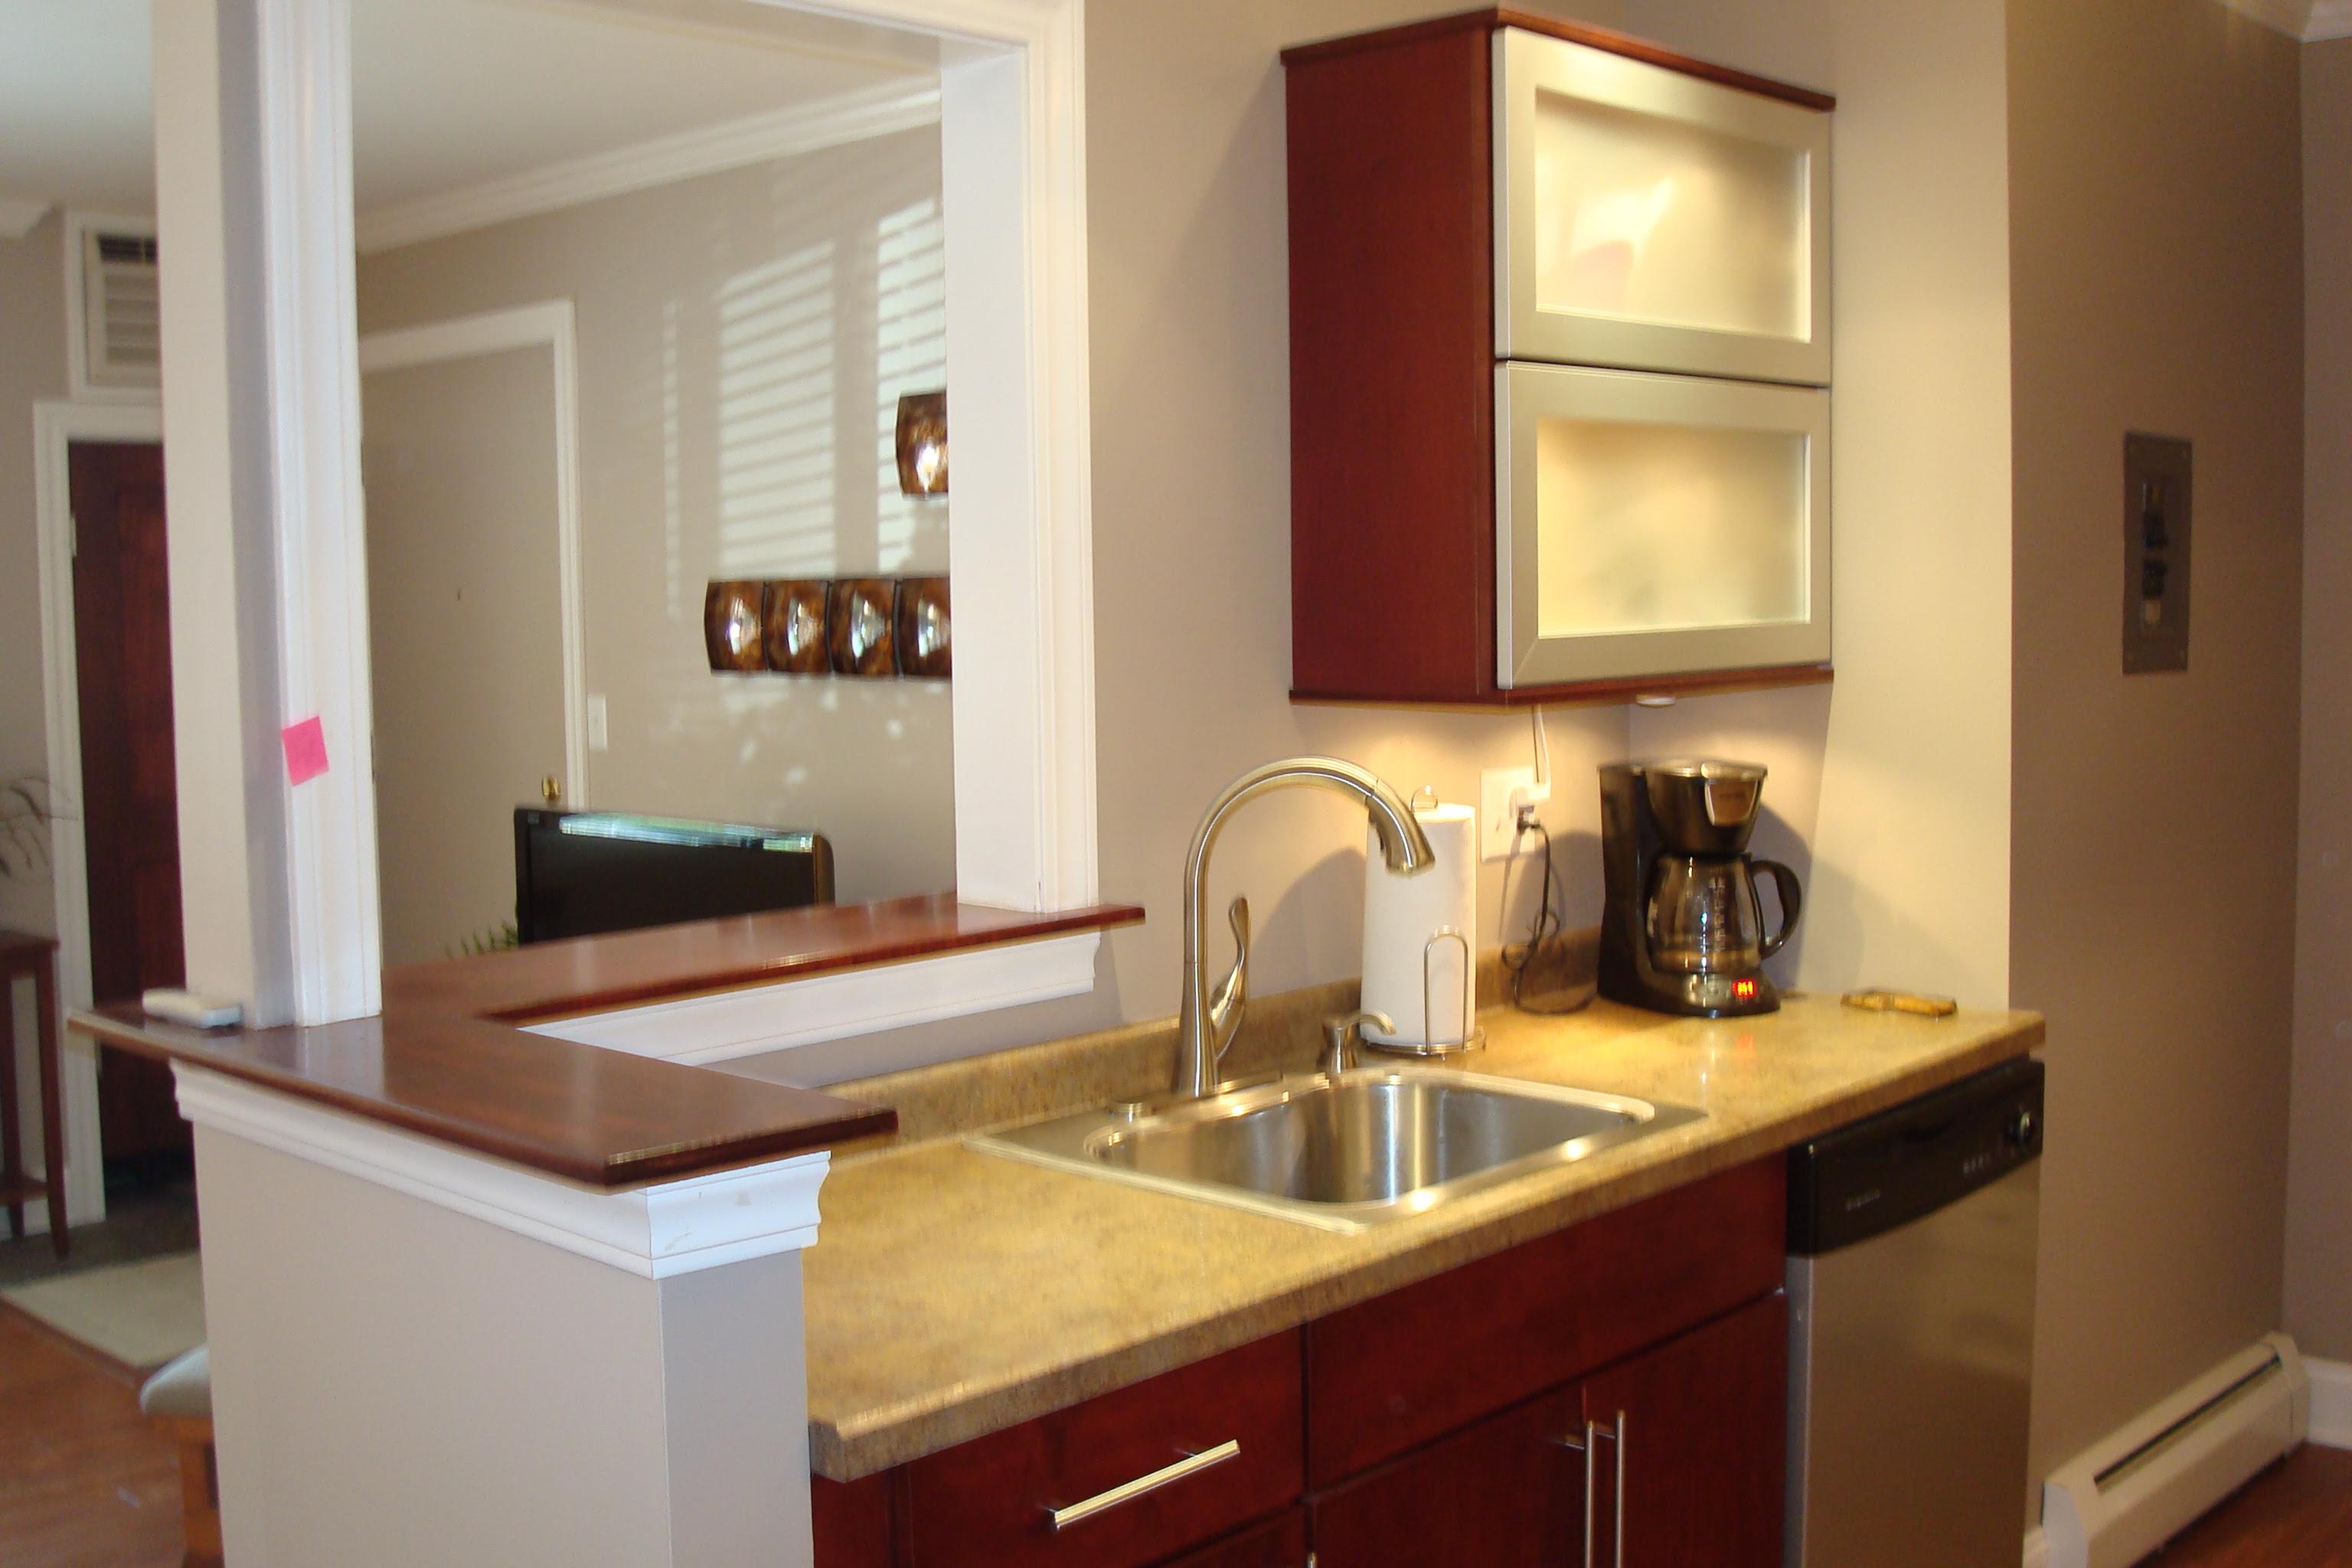 1 Bedroom Apartment Rental Heritage Hill Grand Rapids MI Grand